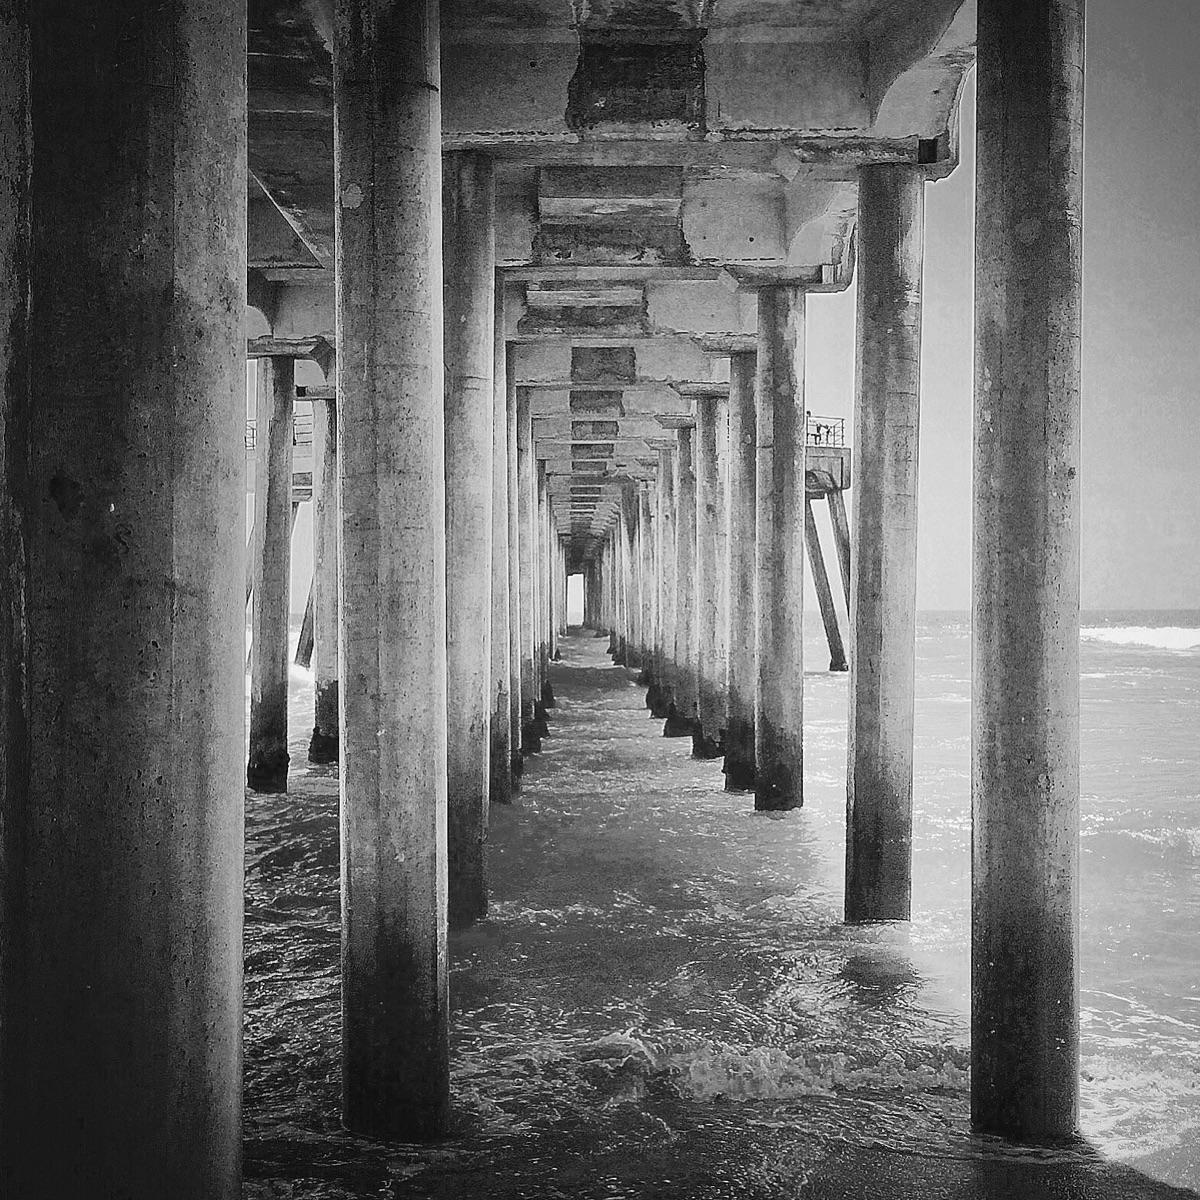 ... HB pier - photography, blackandwhite - j-stu   ello